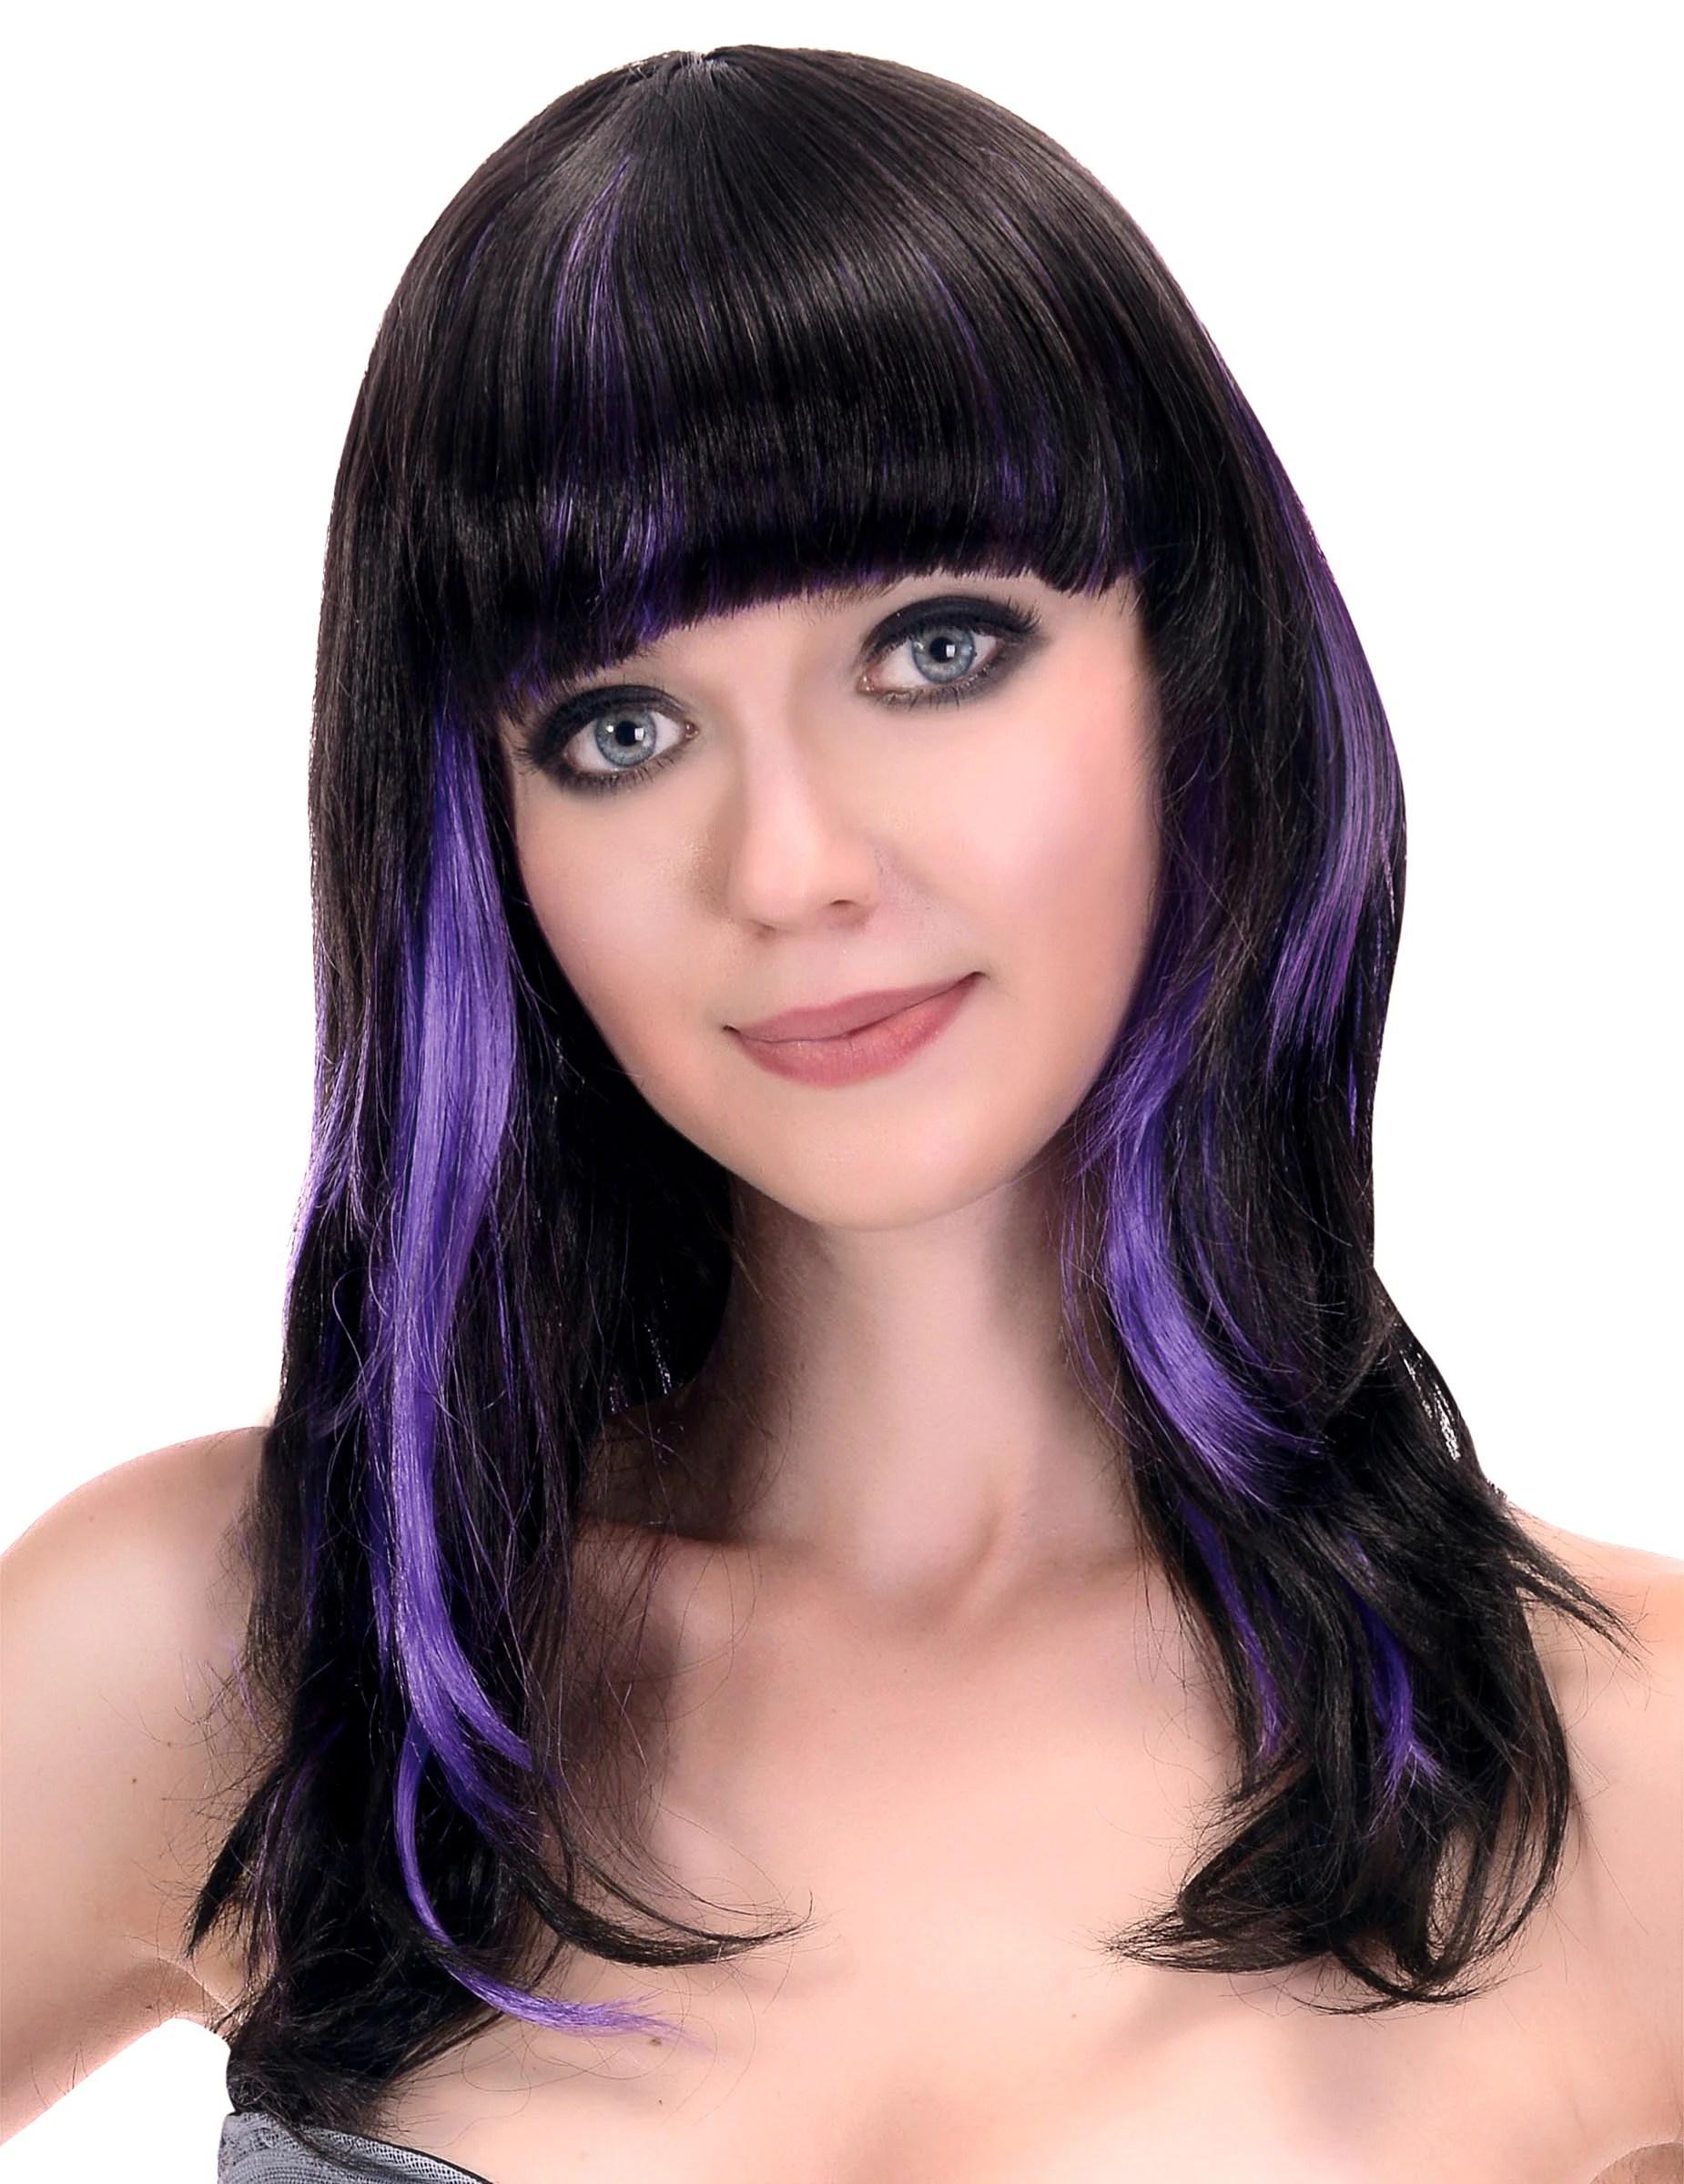 Peluca Negra Flequillo Mechas Violeta Mujer Pelucasy